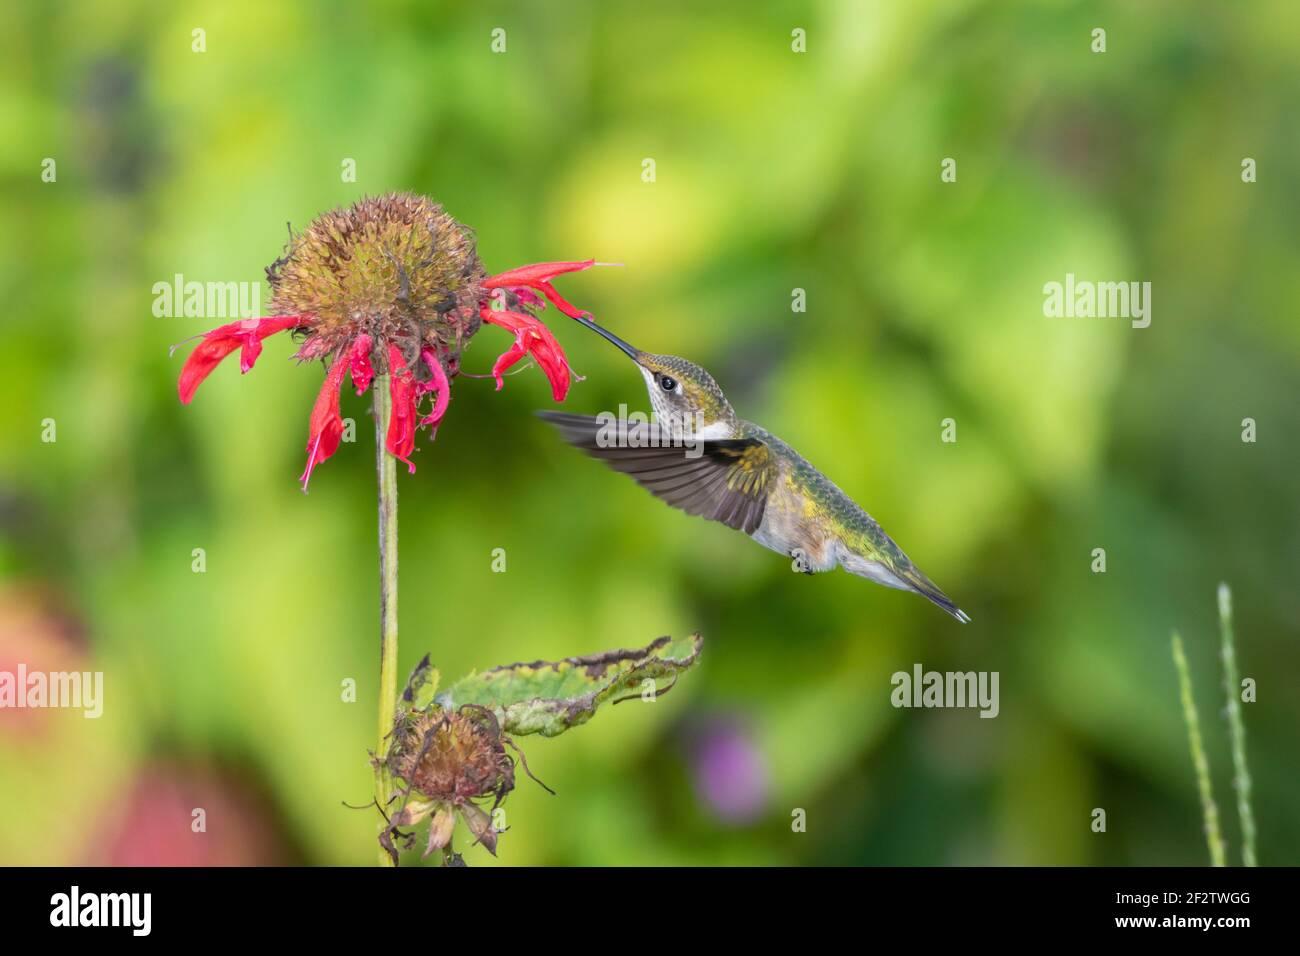 01162-15804 Hummingbird de garganta rubí (Archilochus colubris) en el bálsamo de la abeja roja (Monarda didyma) Marion Co. IL Foto de stock